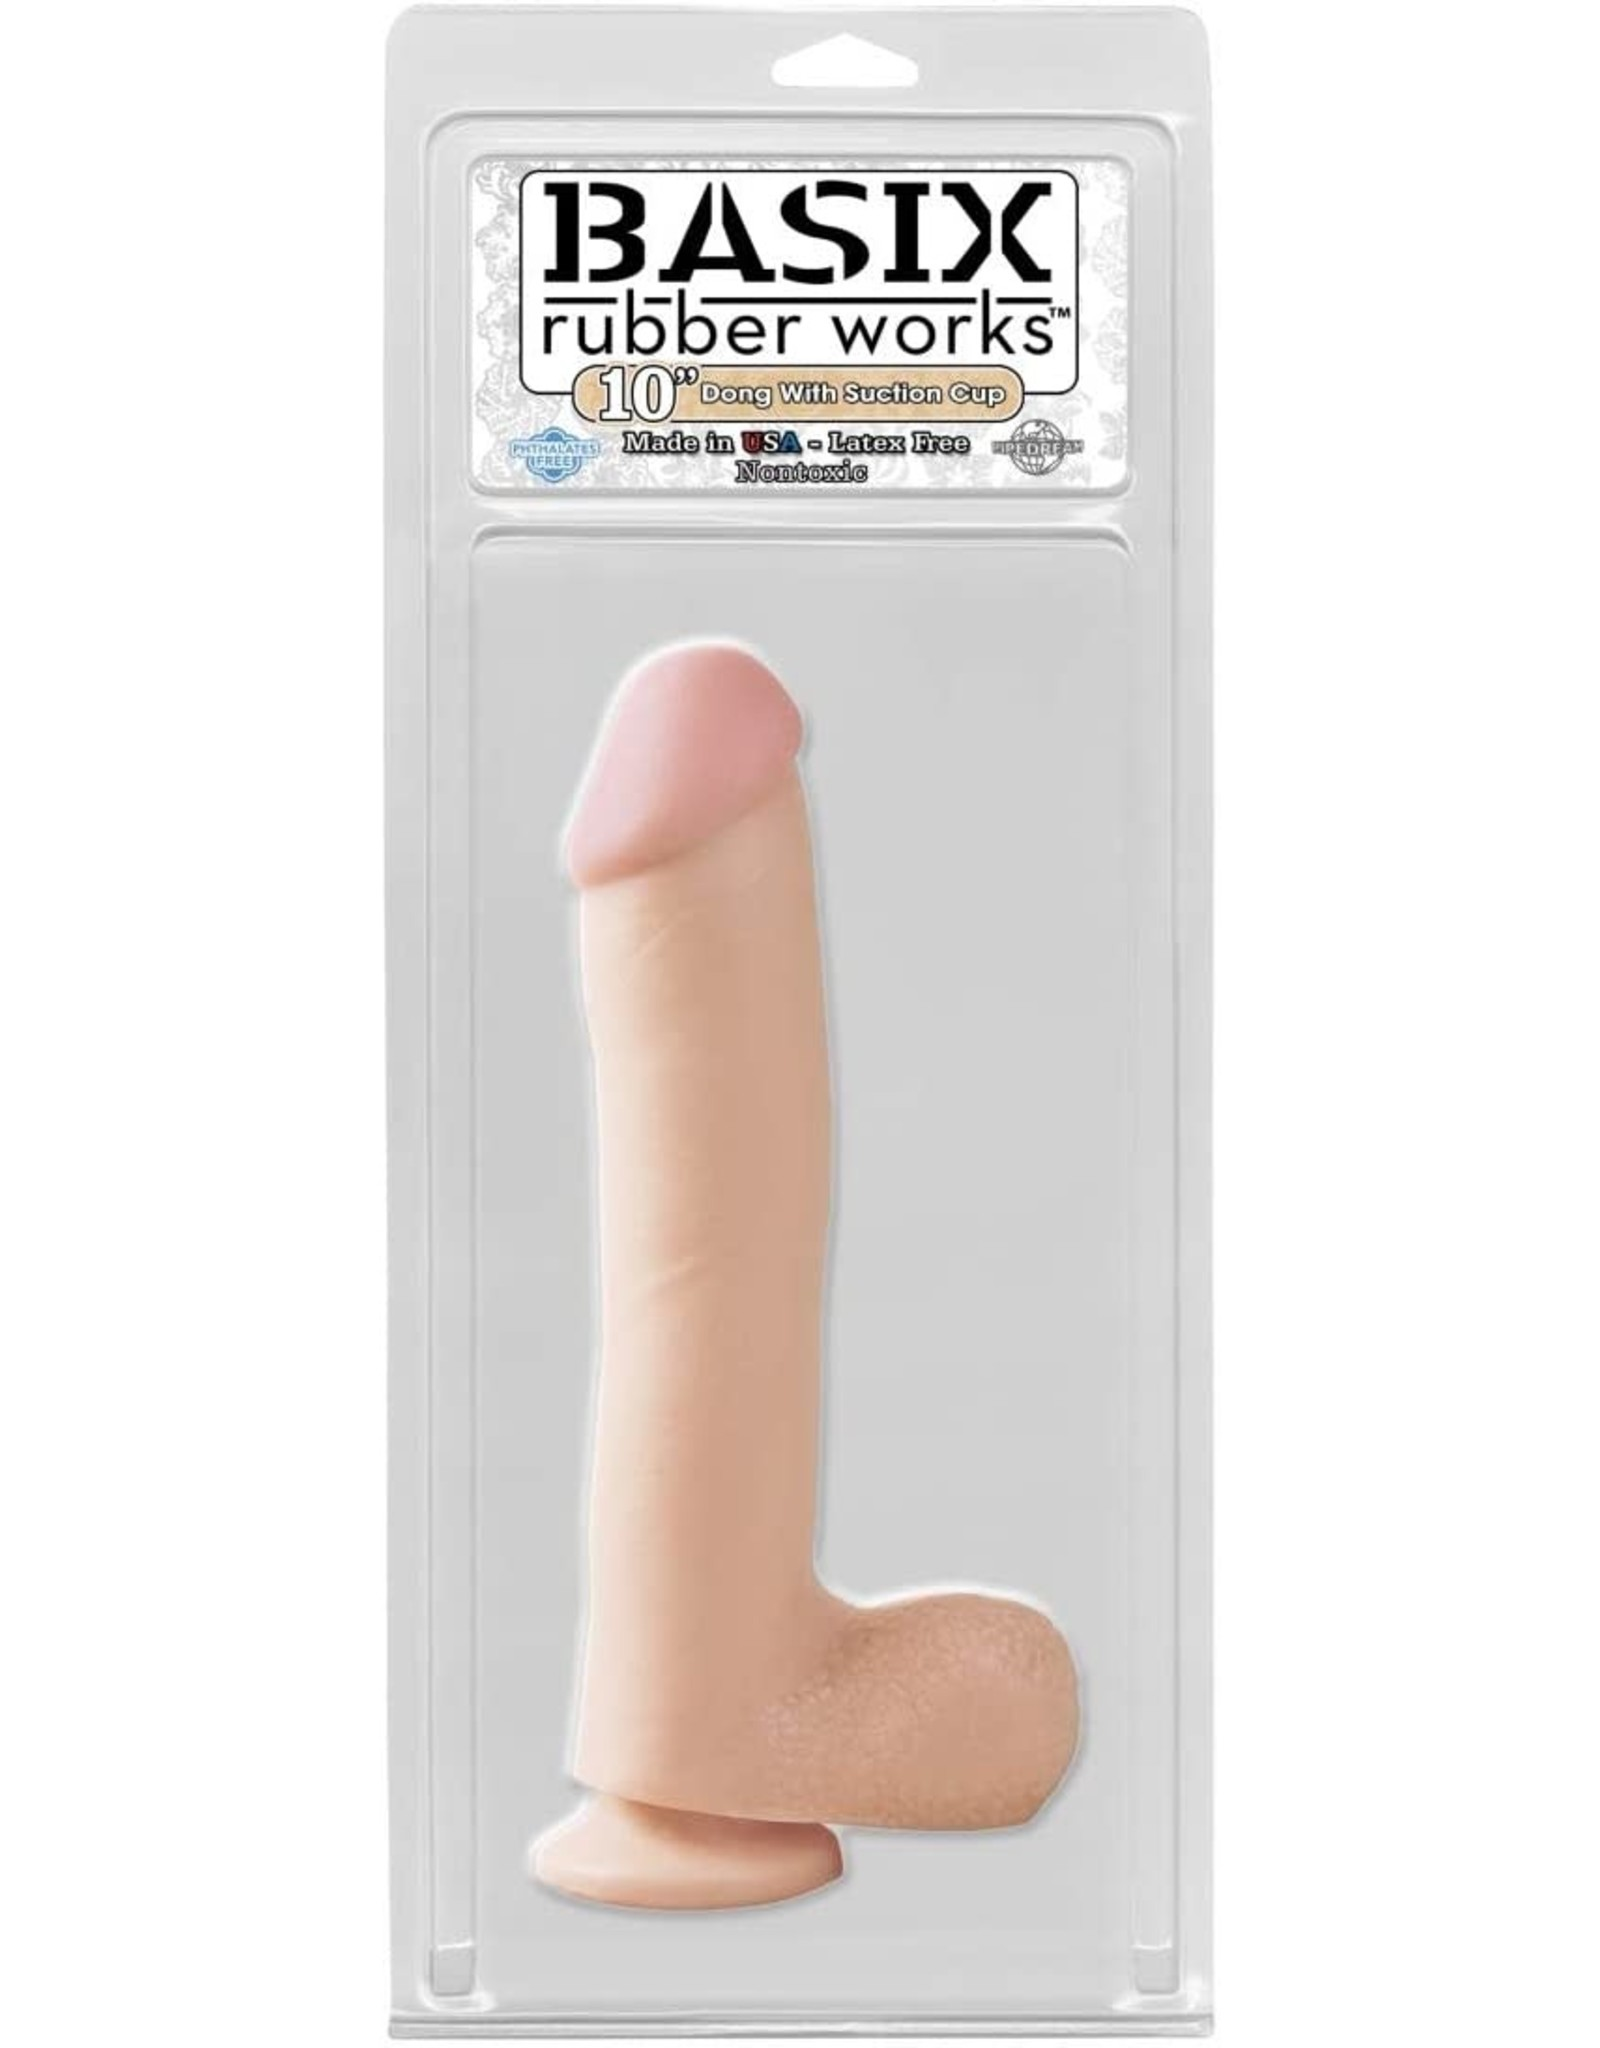 "PIPEDREAM BASIX - 10"" WITH BALLS - FLESH"